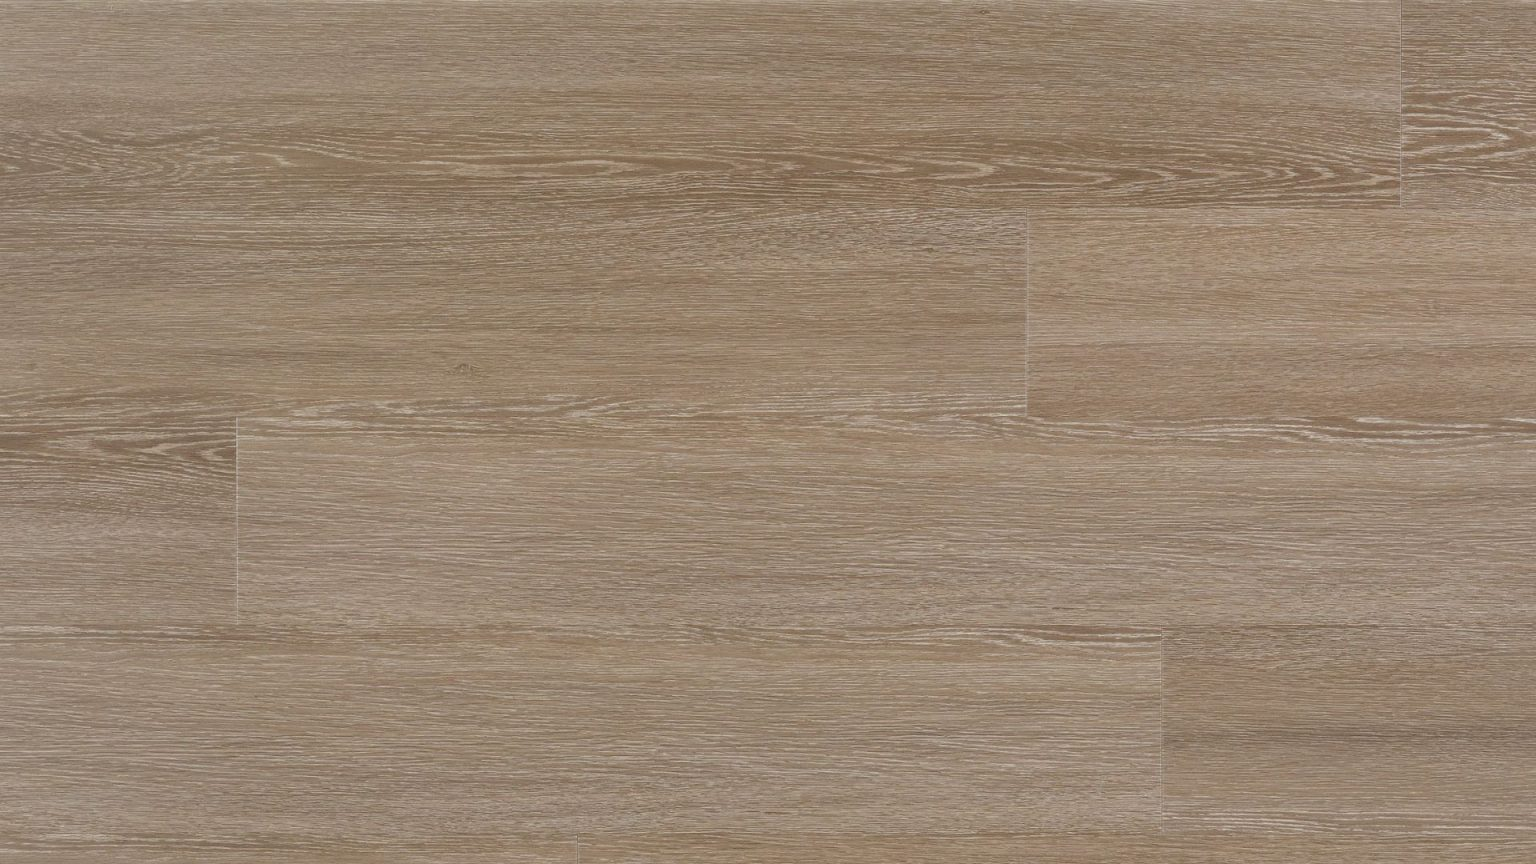 Edmonton 50 LVRE 133 / COREtec® authentics wood